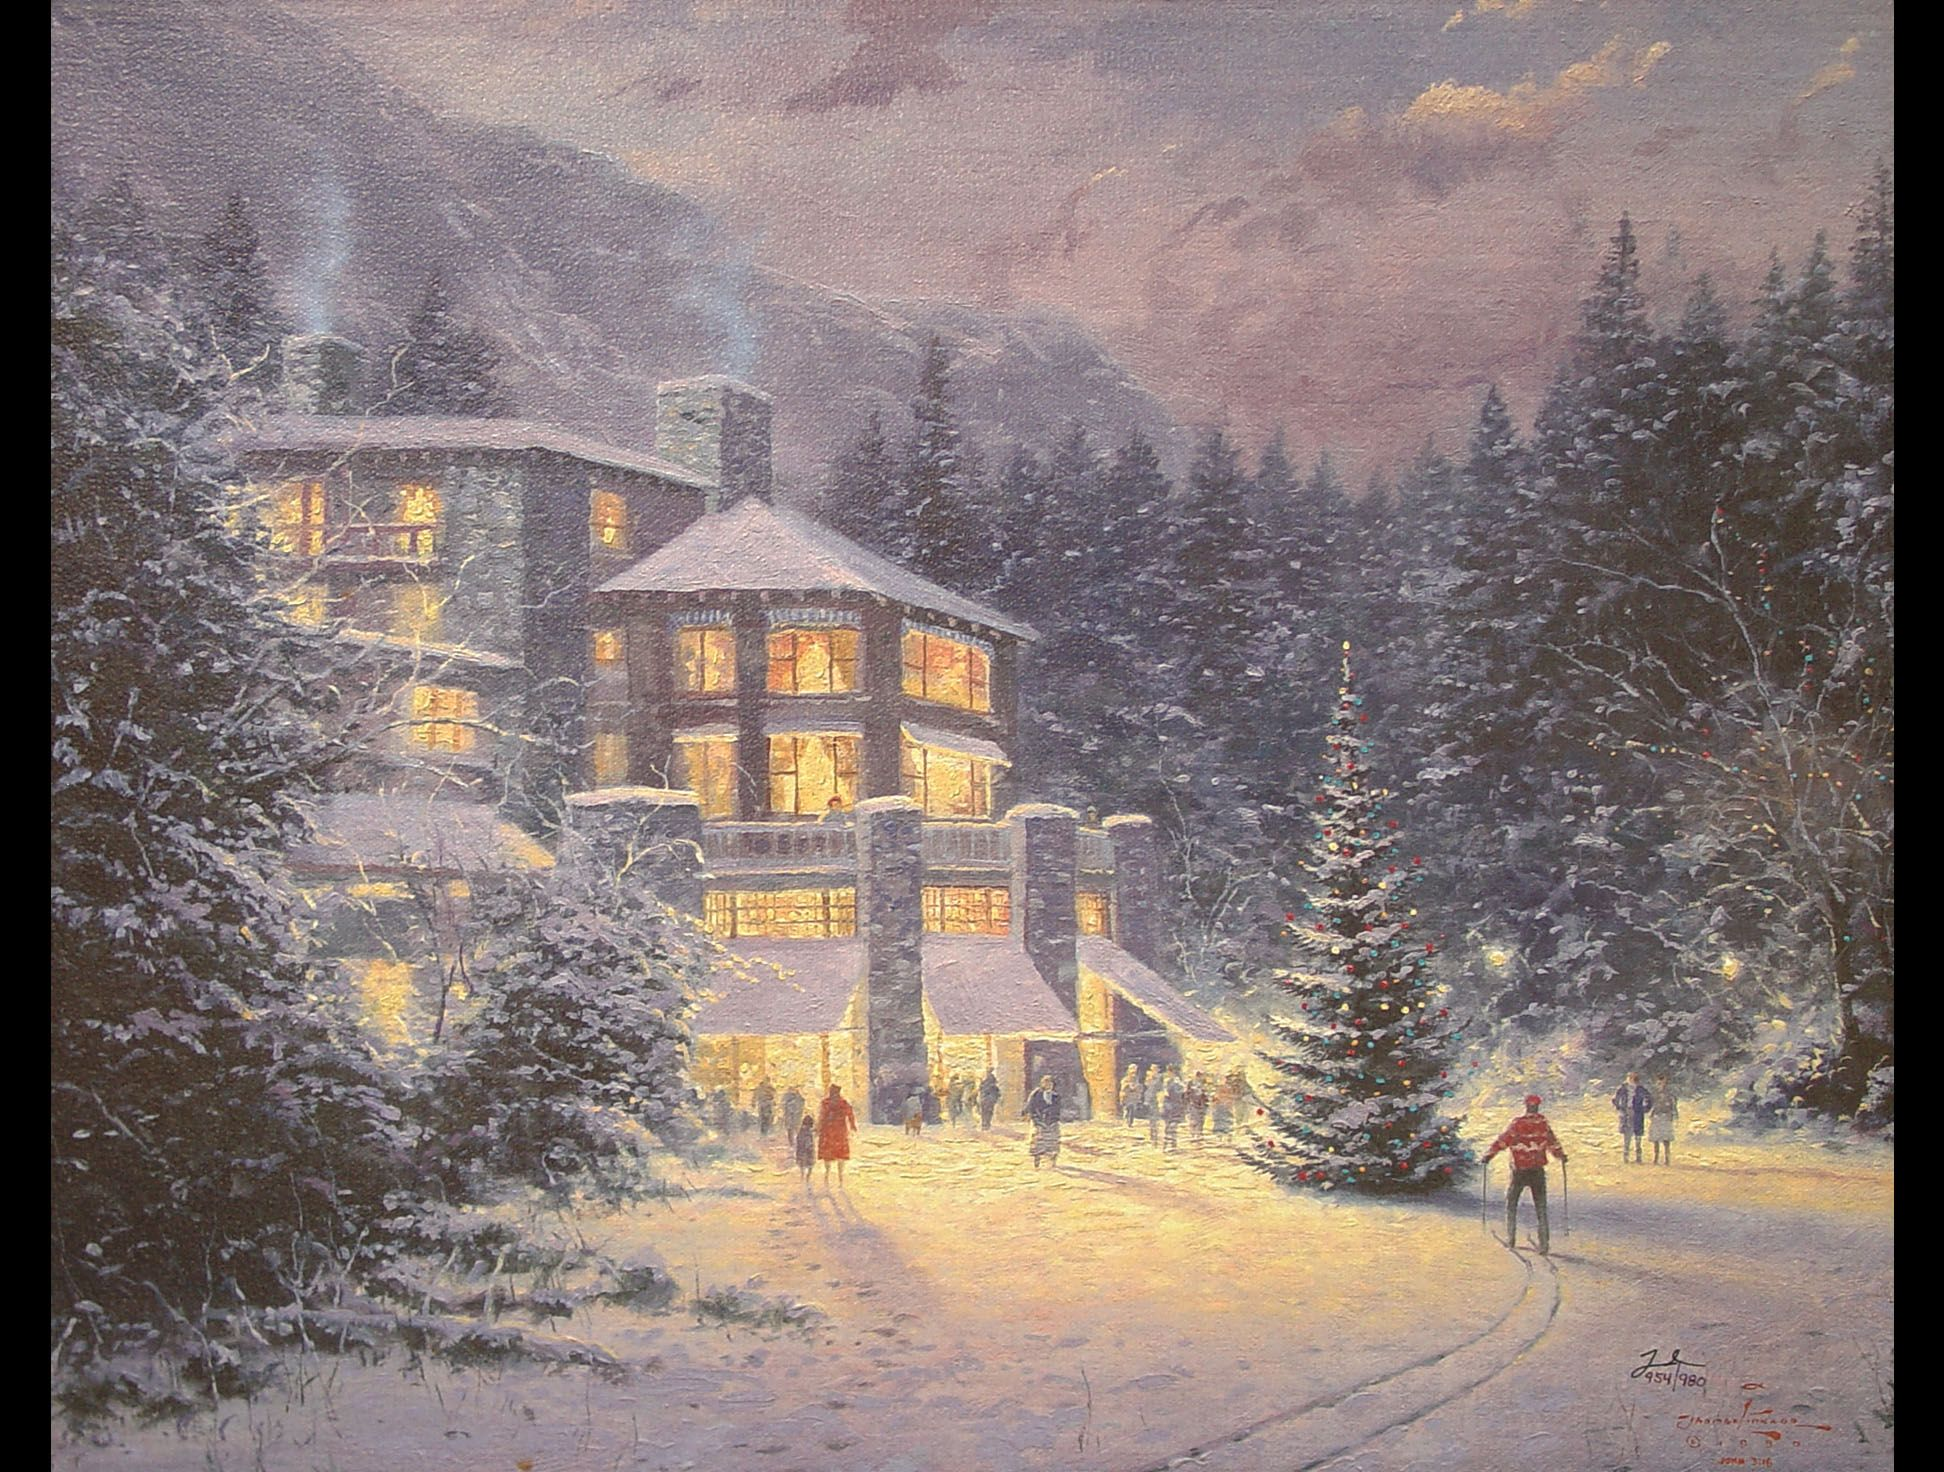 thomas kinkade christmas village | Thomas Kinkade - Christmas at the ...